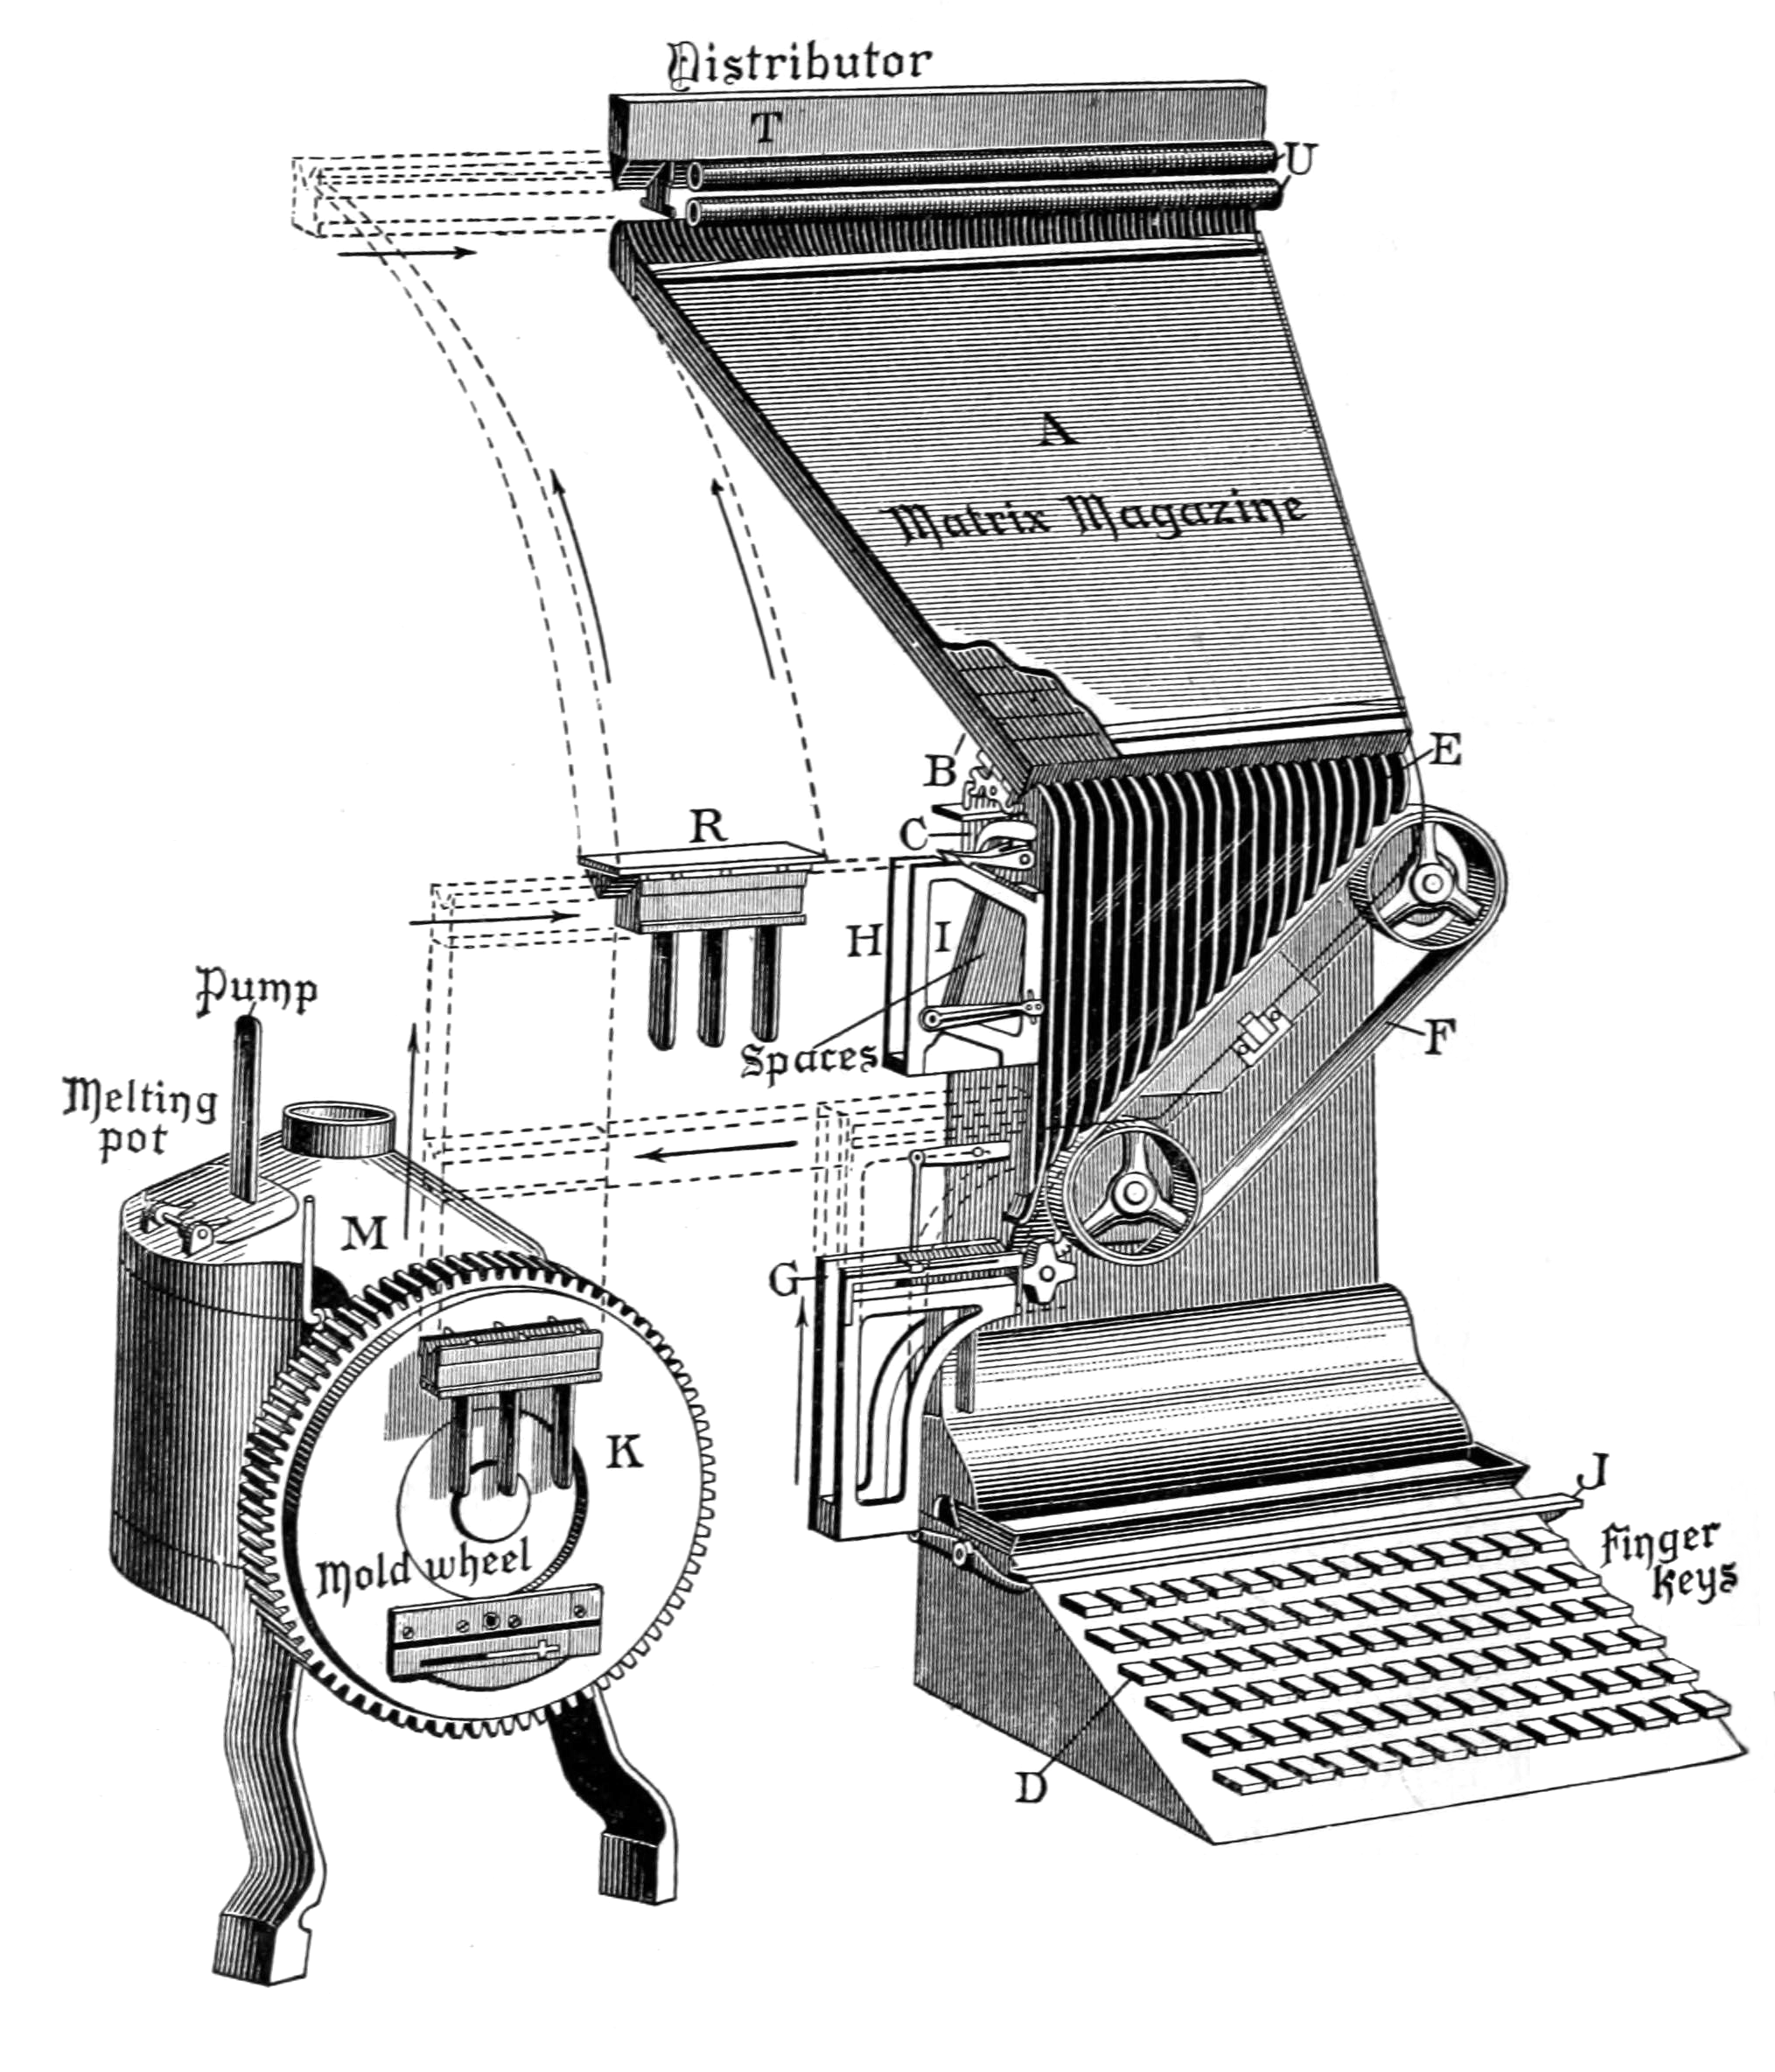 File:De Vinne 1904 - Linotype machine diagram png - Wikipedia